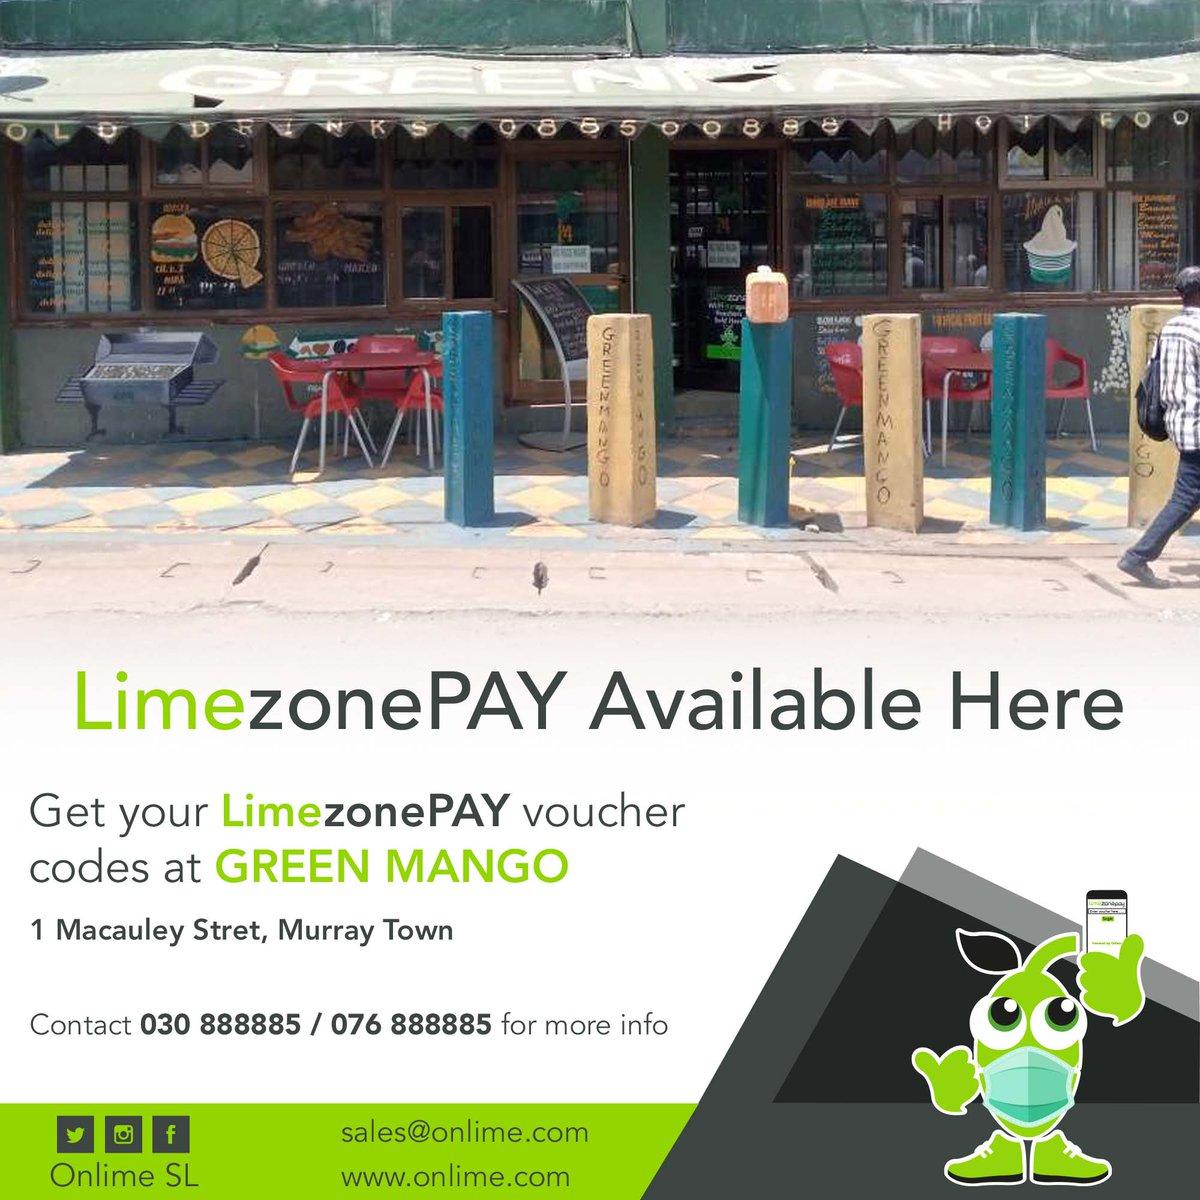 Get your LimezonePAY Voucher codes from Green Mango, 1 Macauley Street Murray Town. contact +23230888885/+23276888885 for more info. #Staywell #StaySafe #LimezonePAY #SuperfastInternet #ABundleOfCheapData https://t.co/sXtnA2Mhec